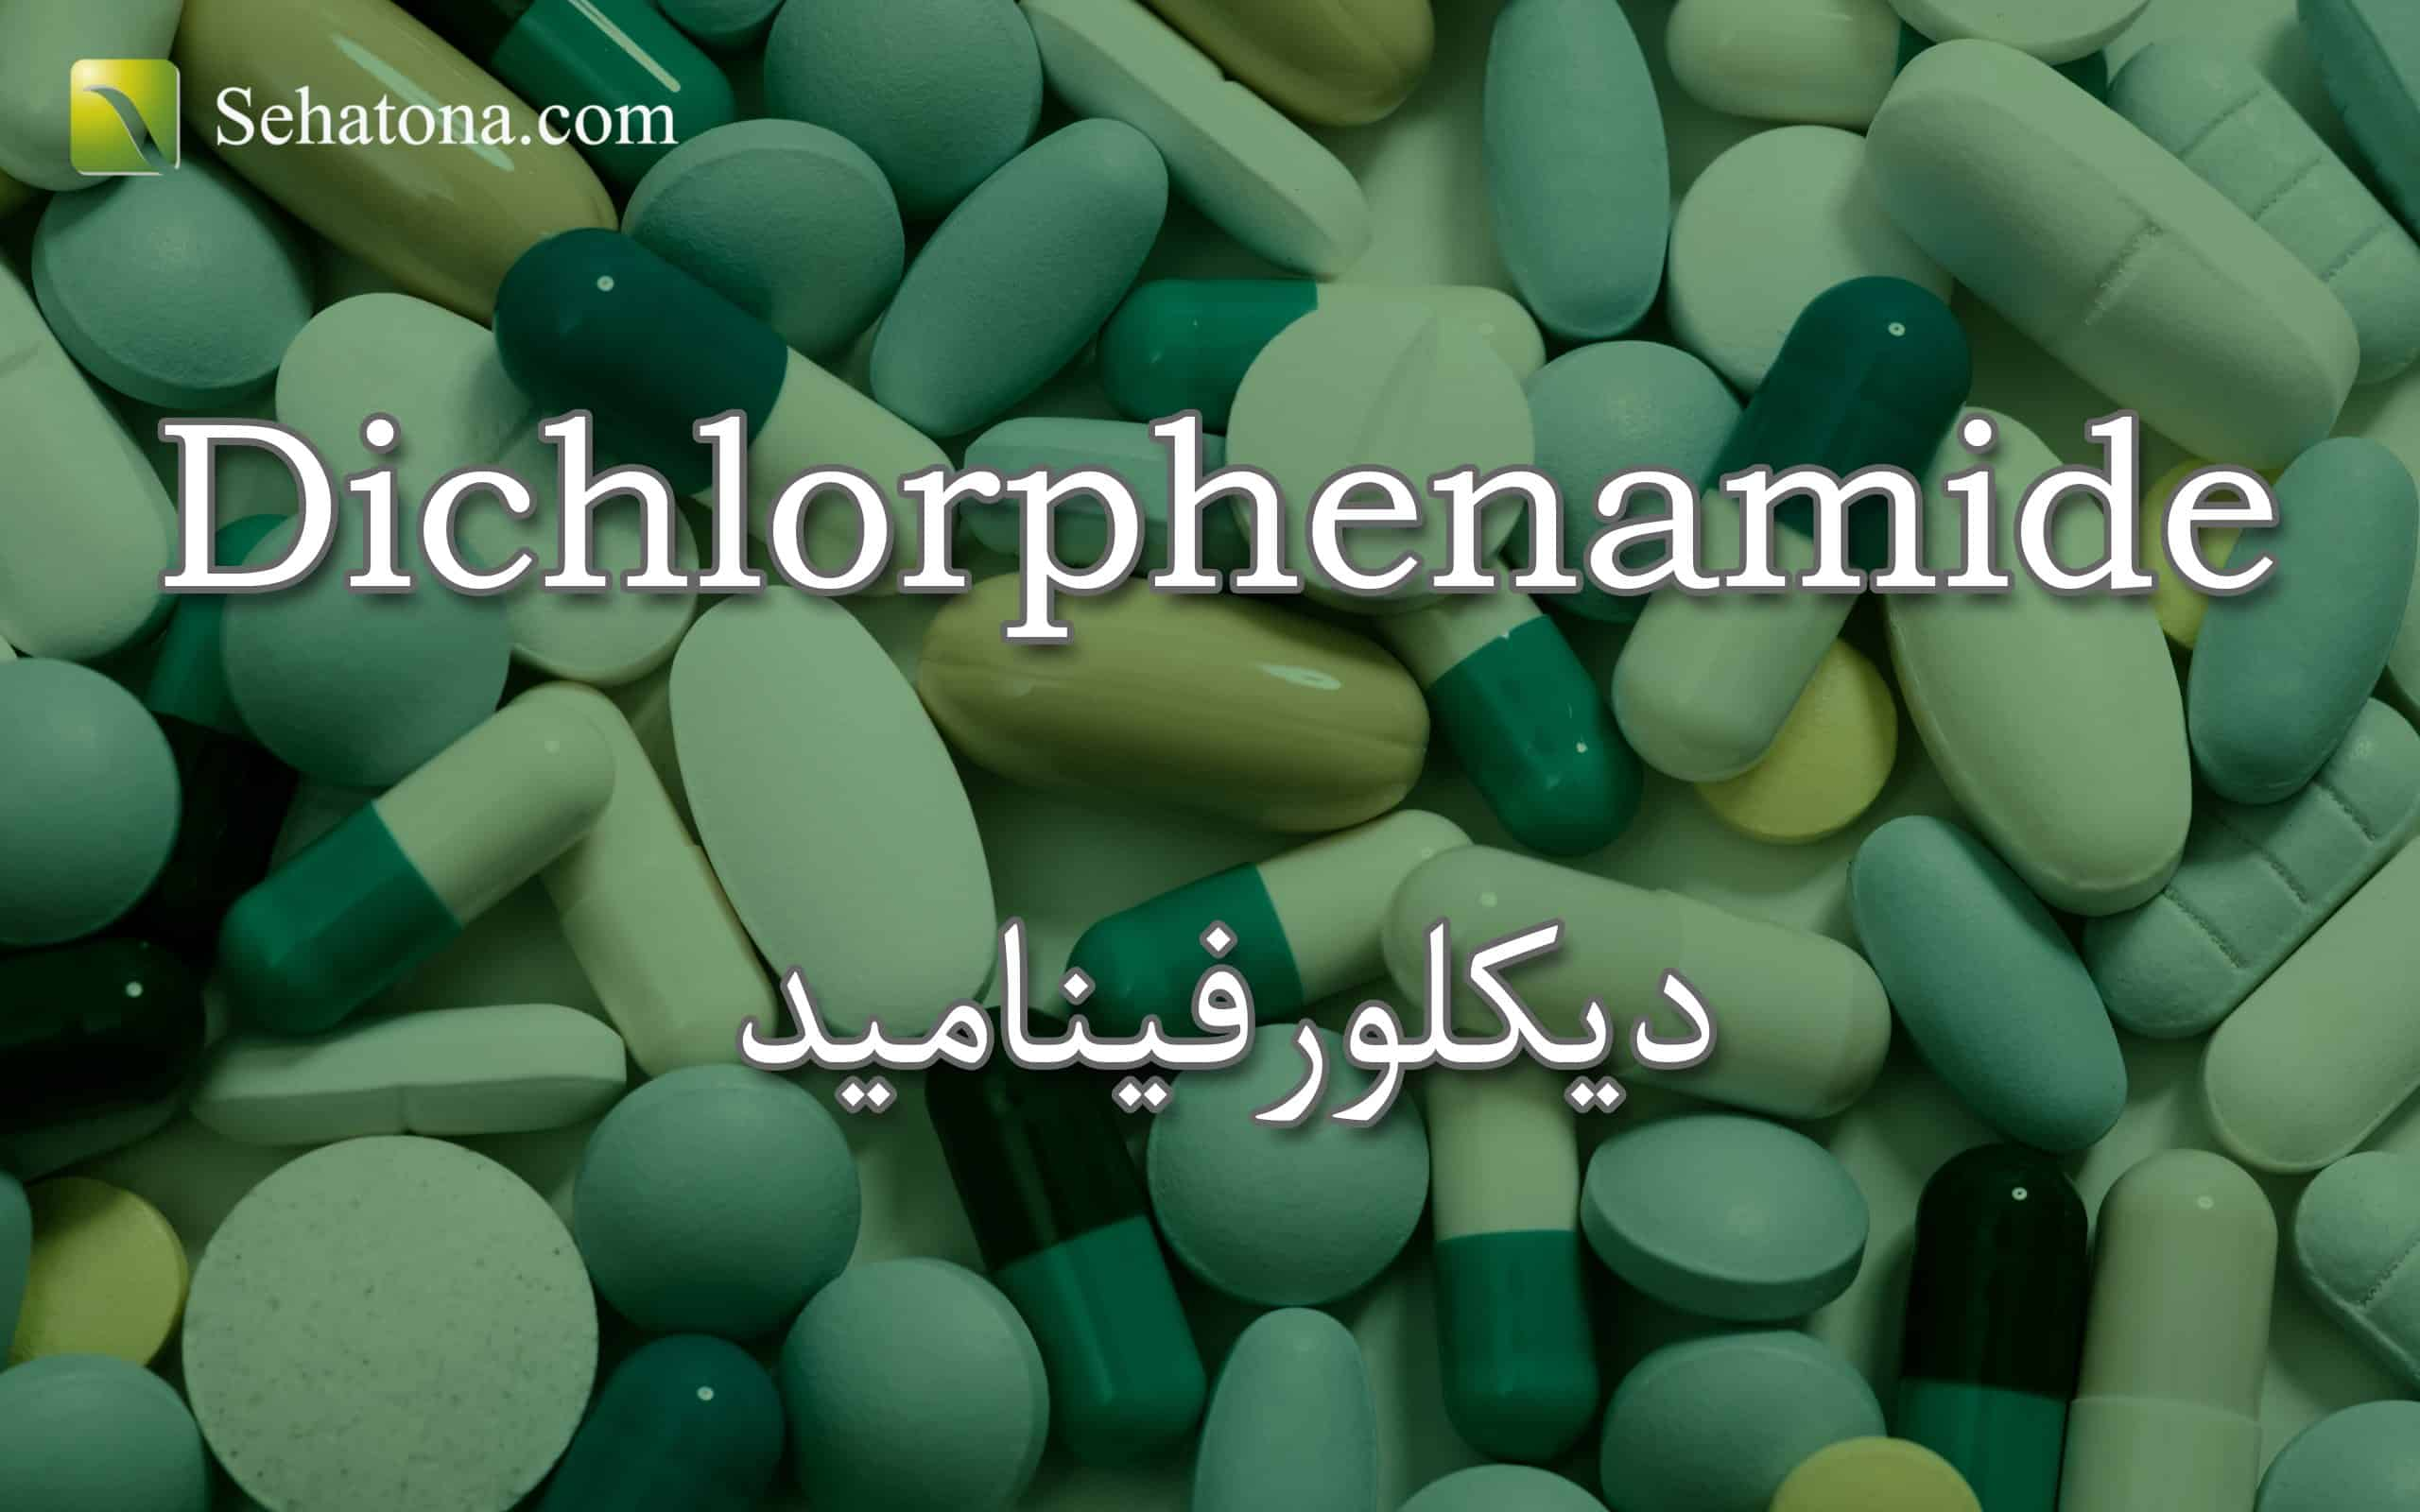 Dichlorphenamide